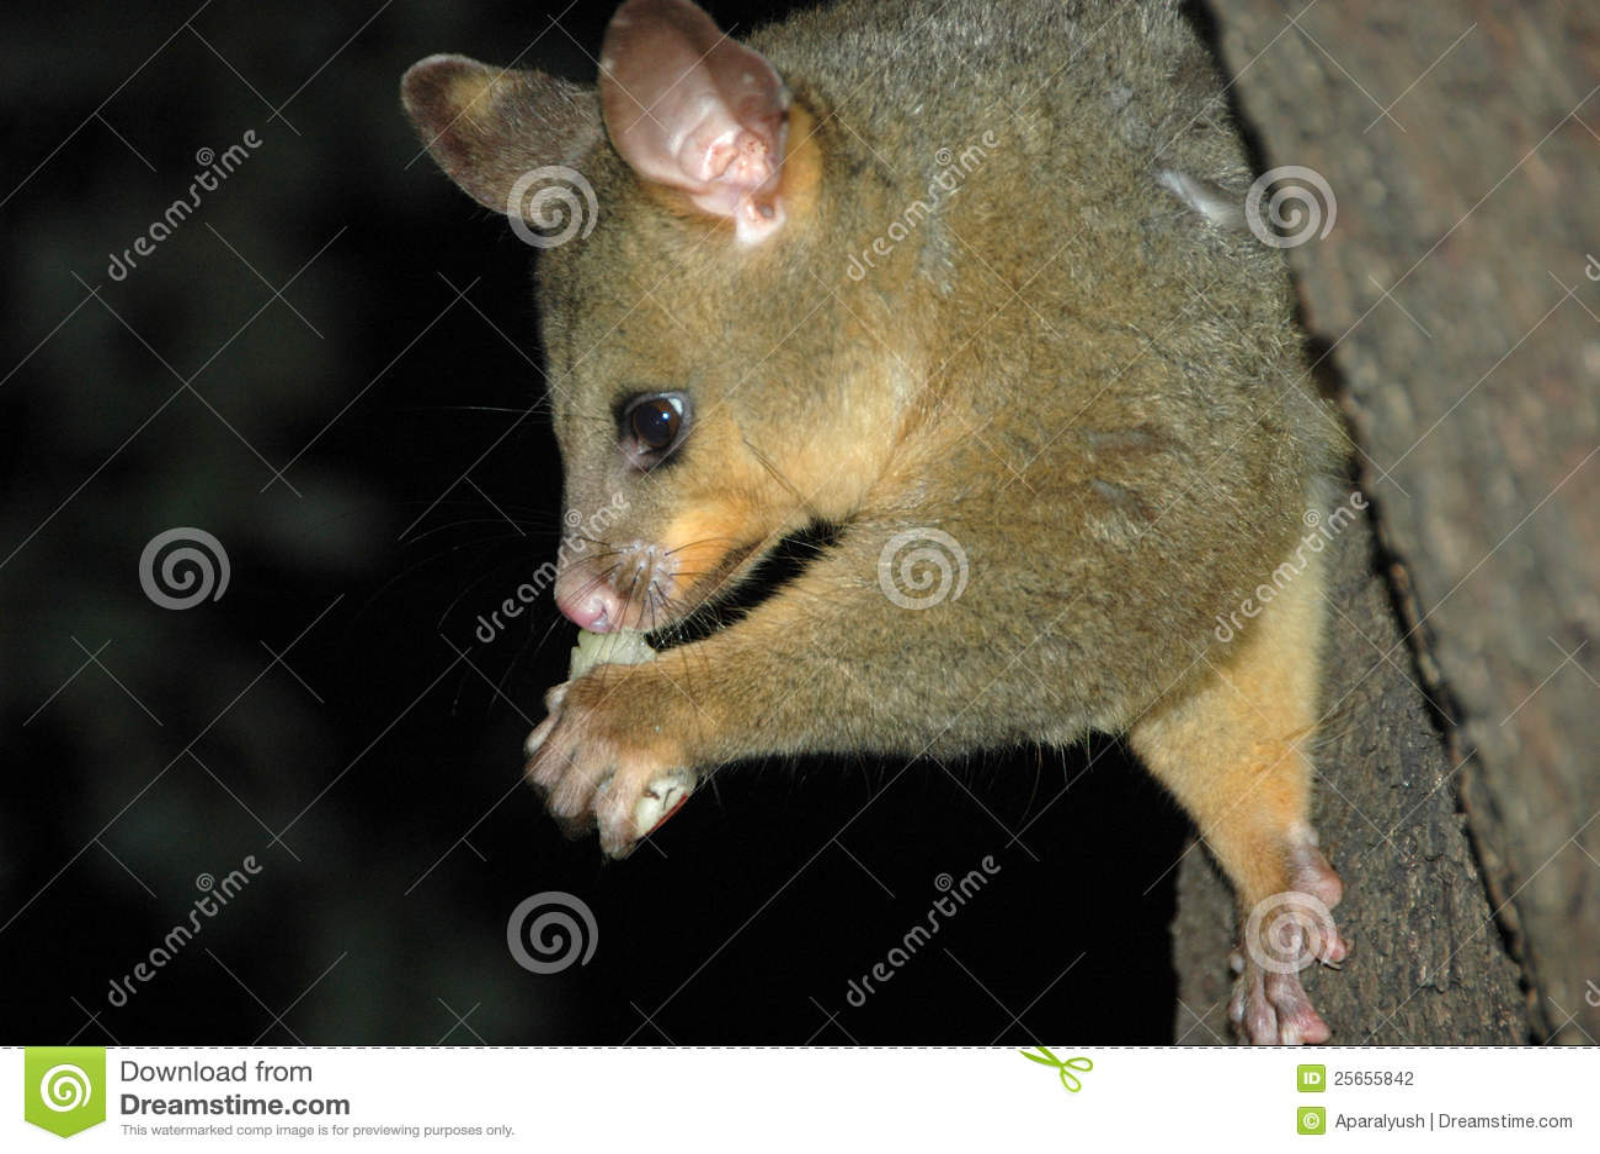 Australian Possum Eating A Piece Of Fruit Stock Photo